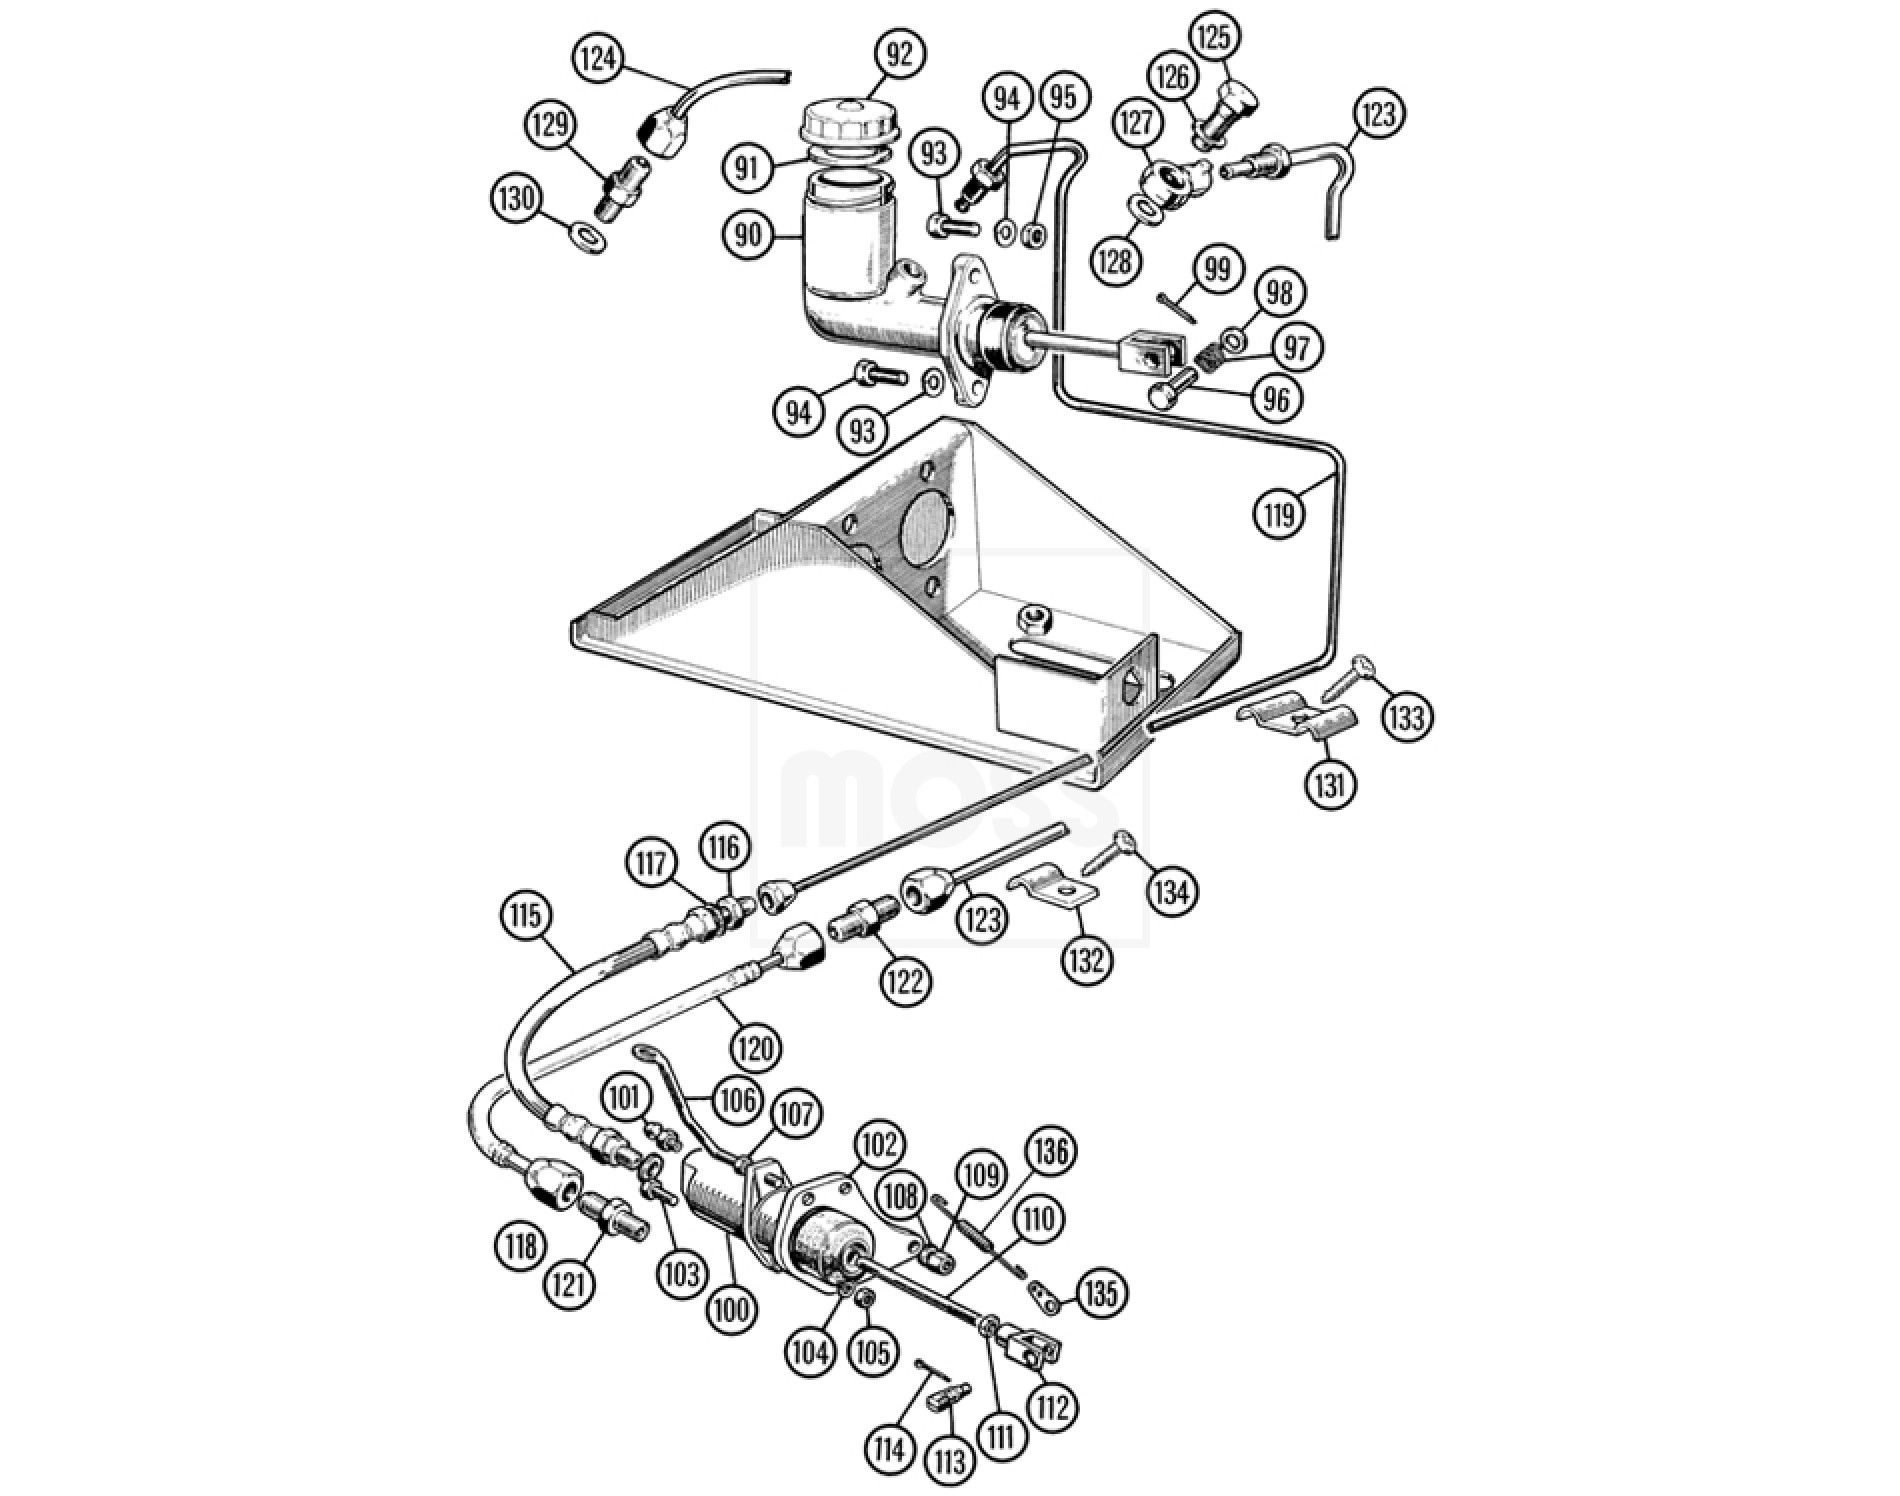 Girling Clutch Hydraulics: TR4-4A